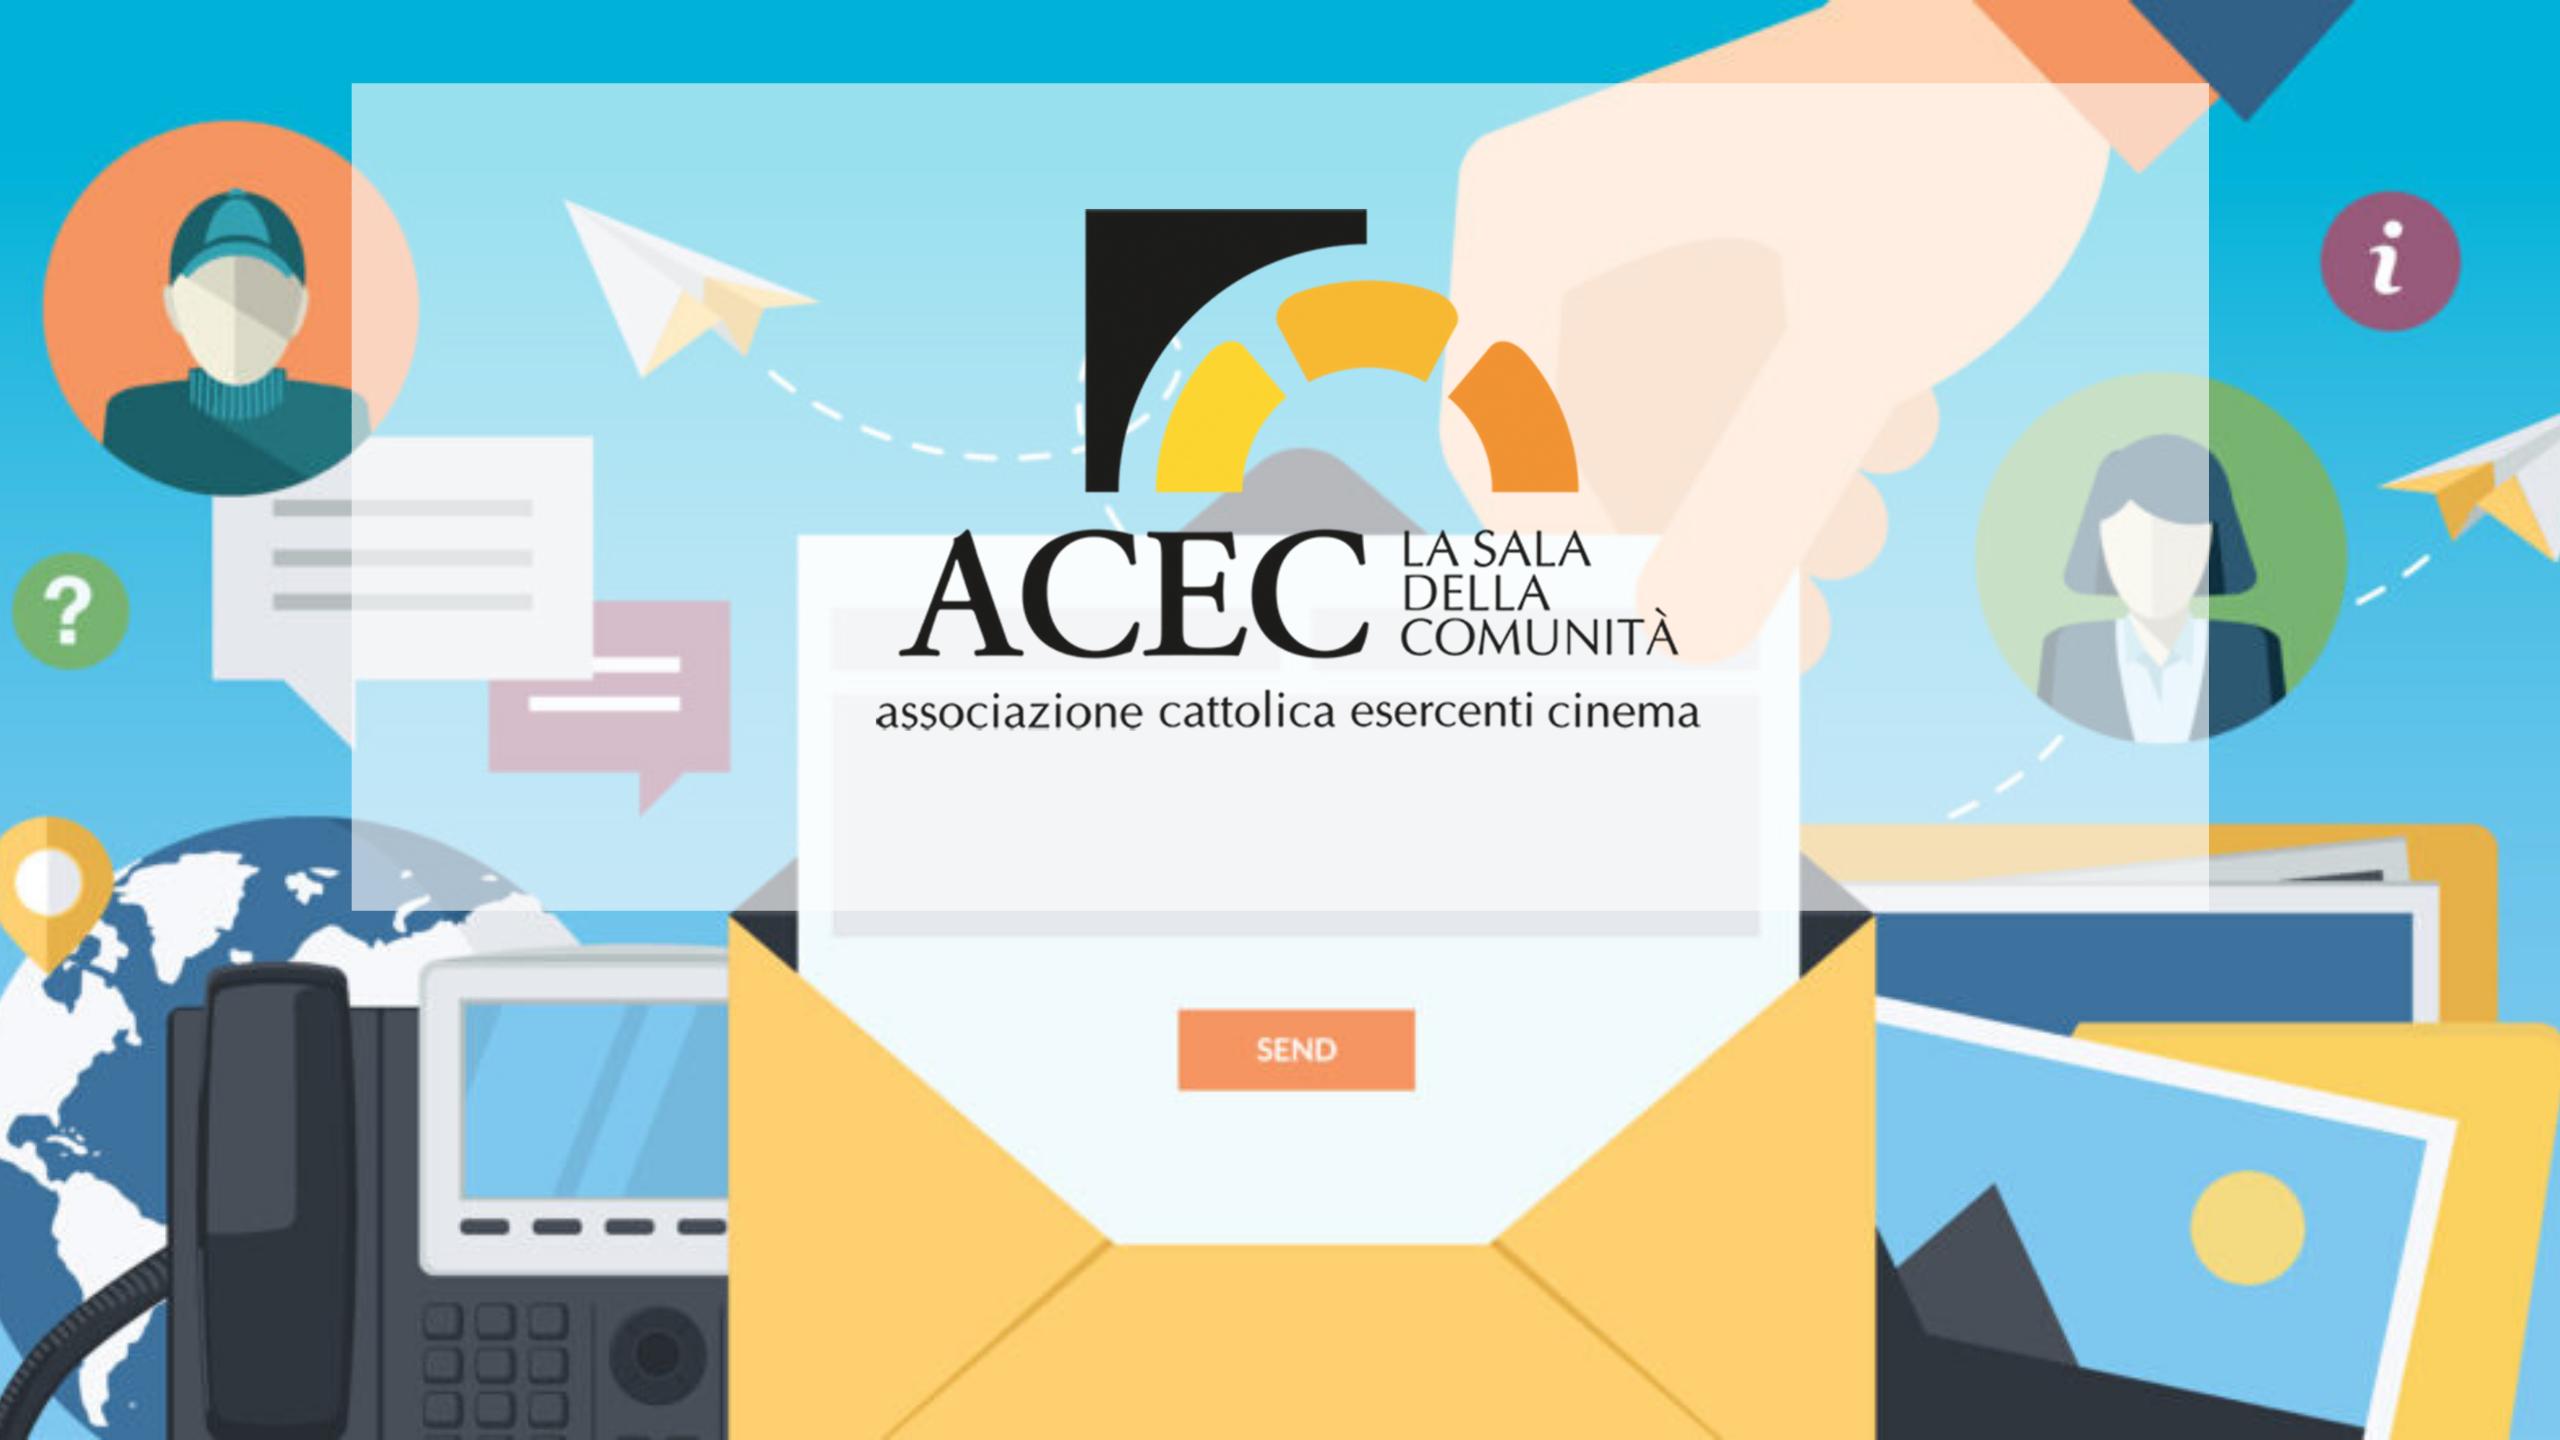 ACEC comunicazione